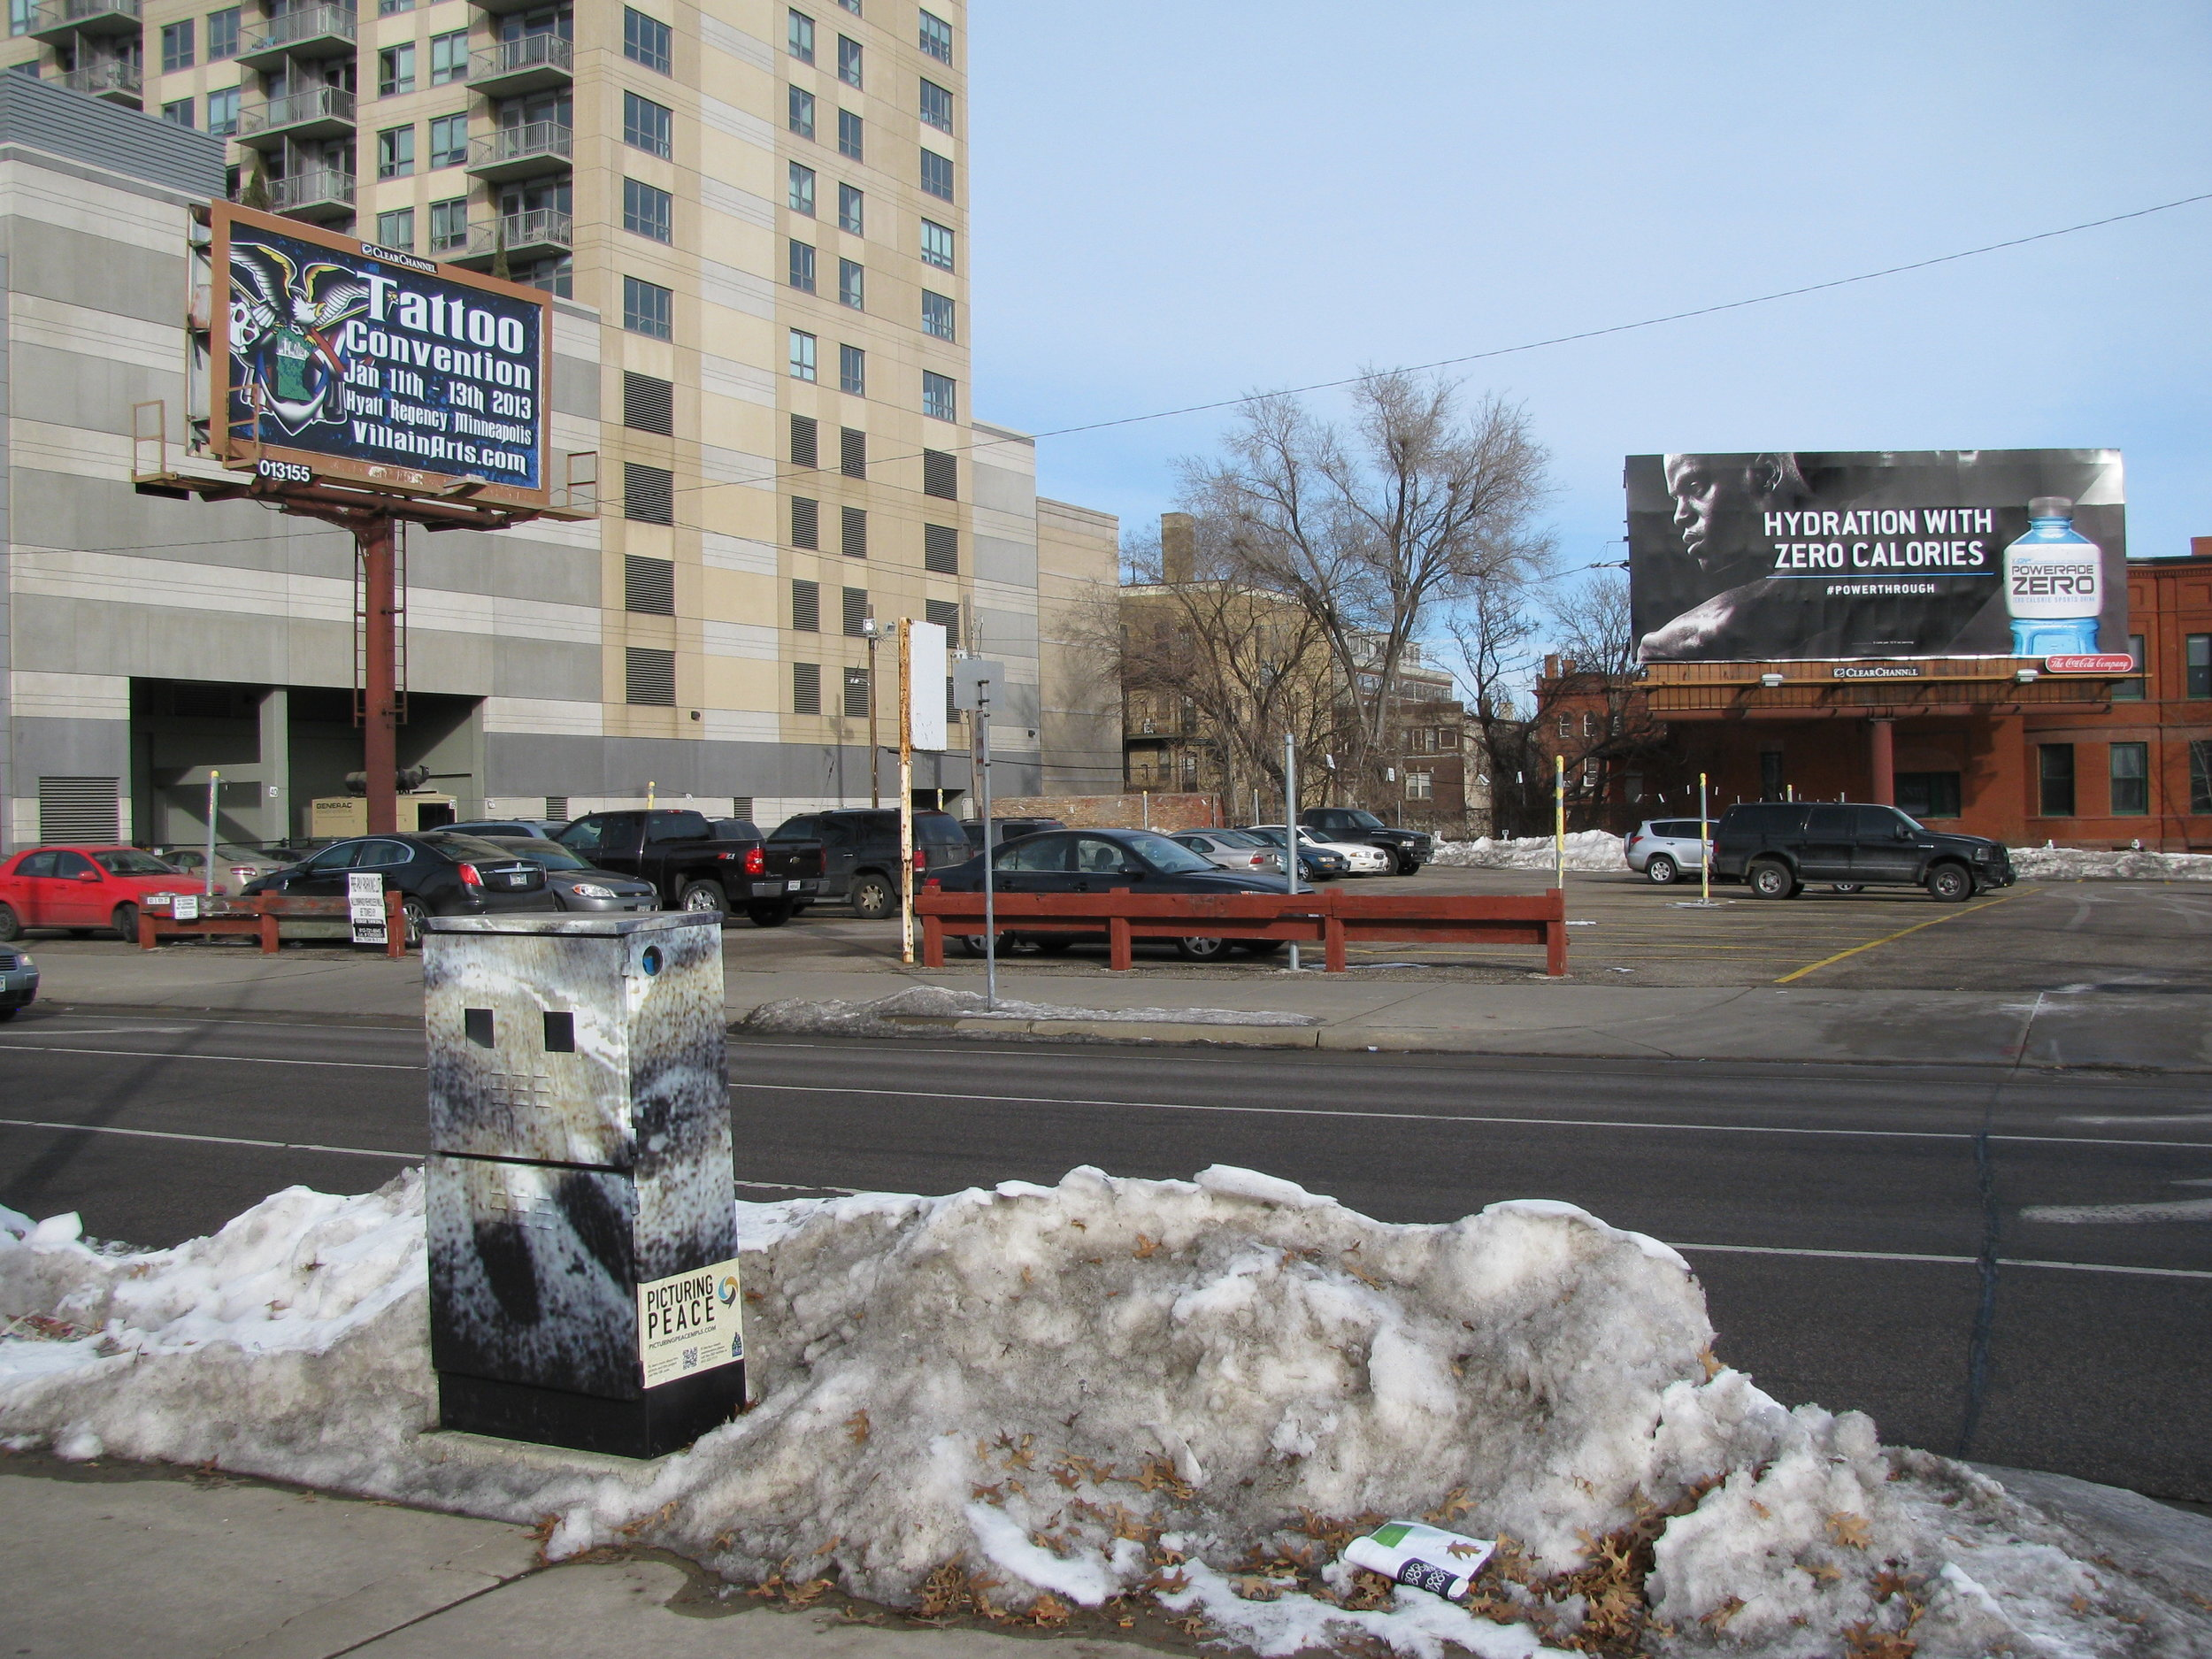 CleanSlateGroup_GraffitiResistant_Minneapolis,MN_32.JPG